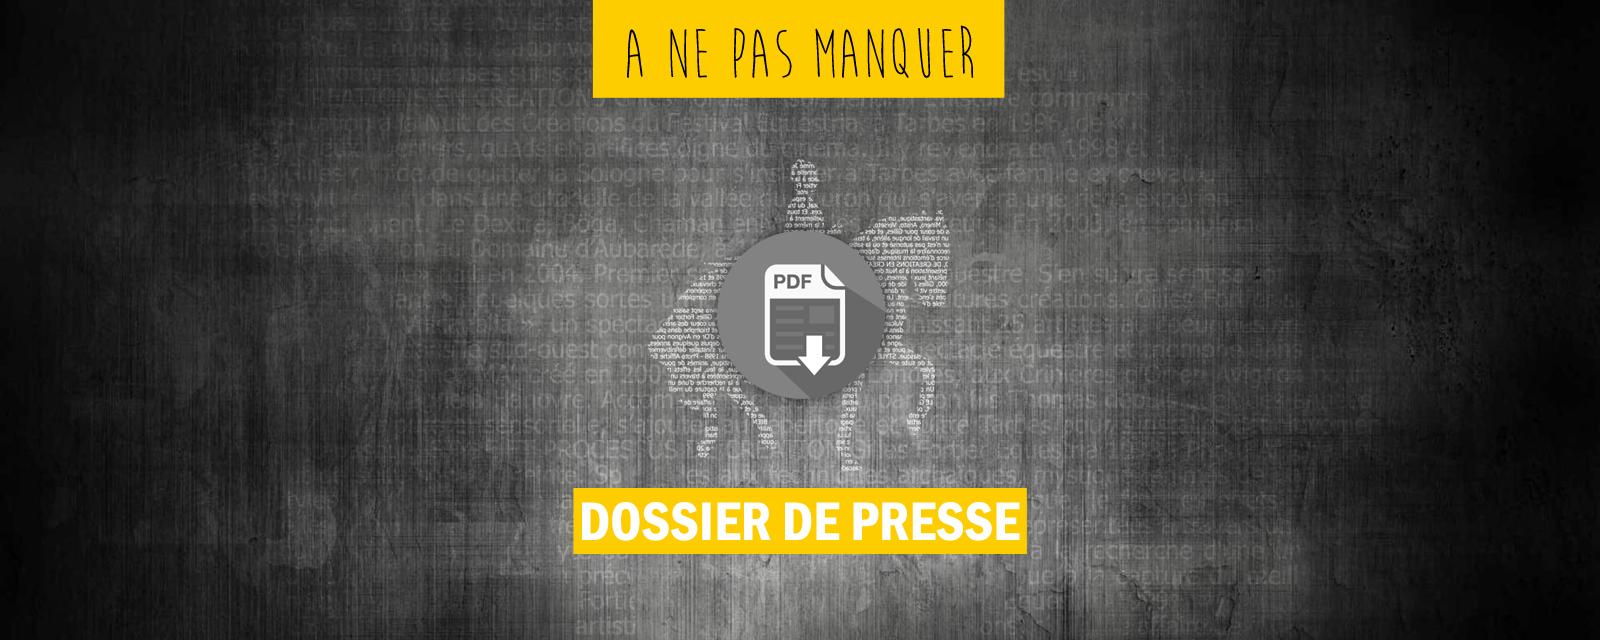 Dossier de presse Gilles Fortier